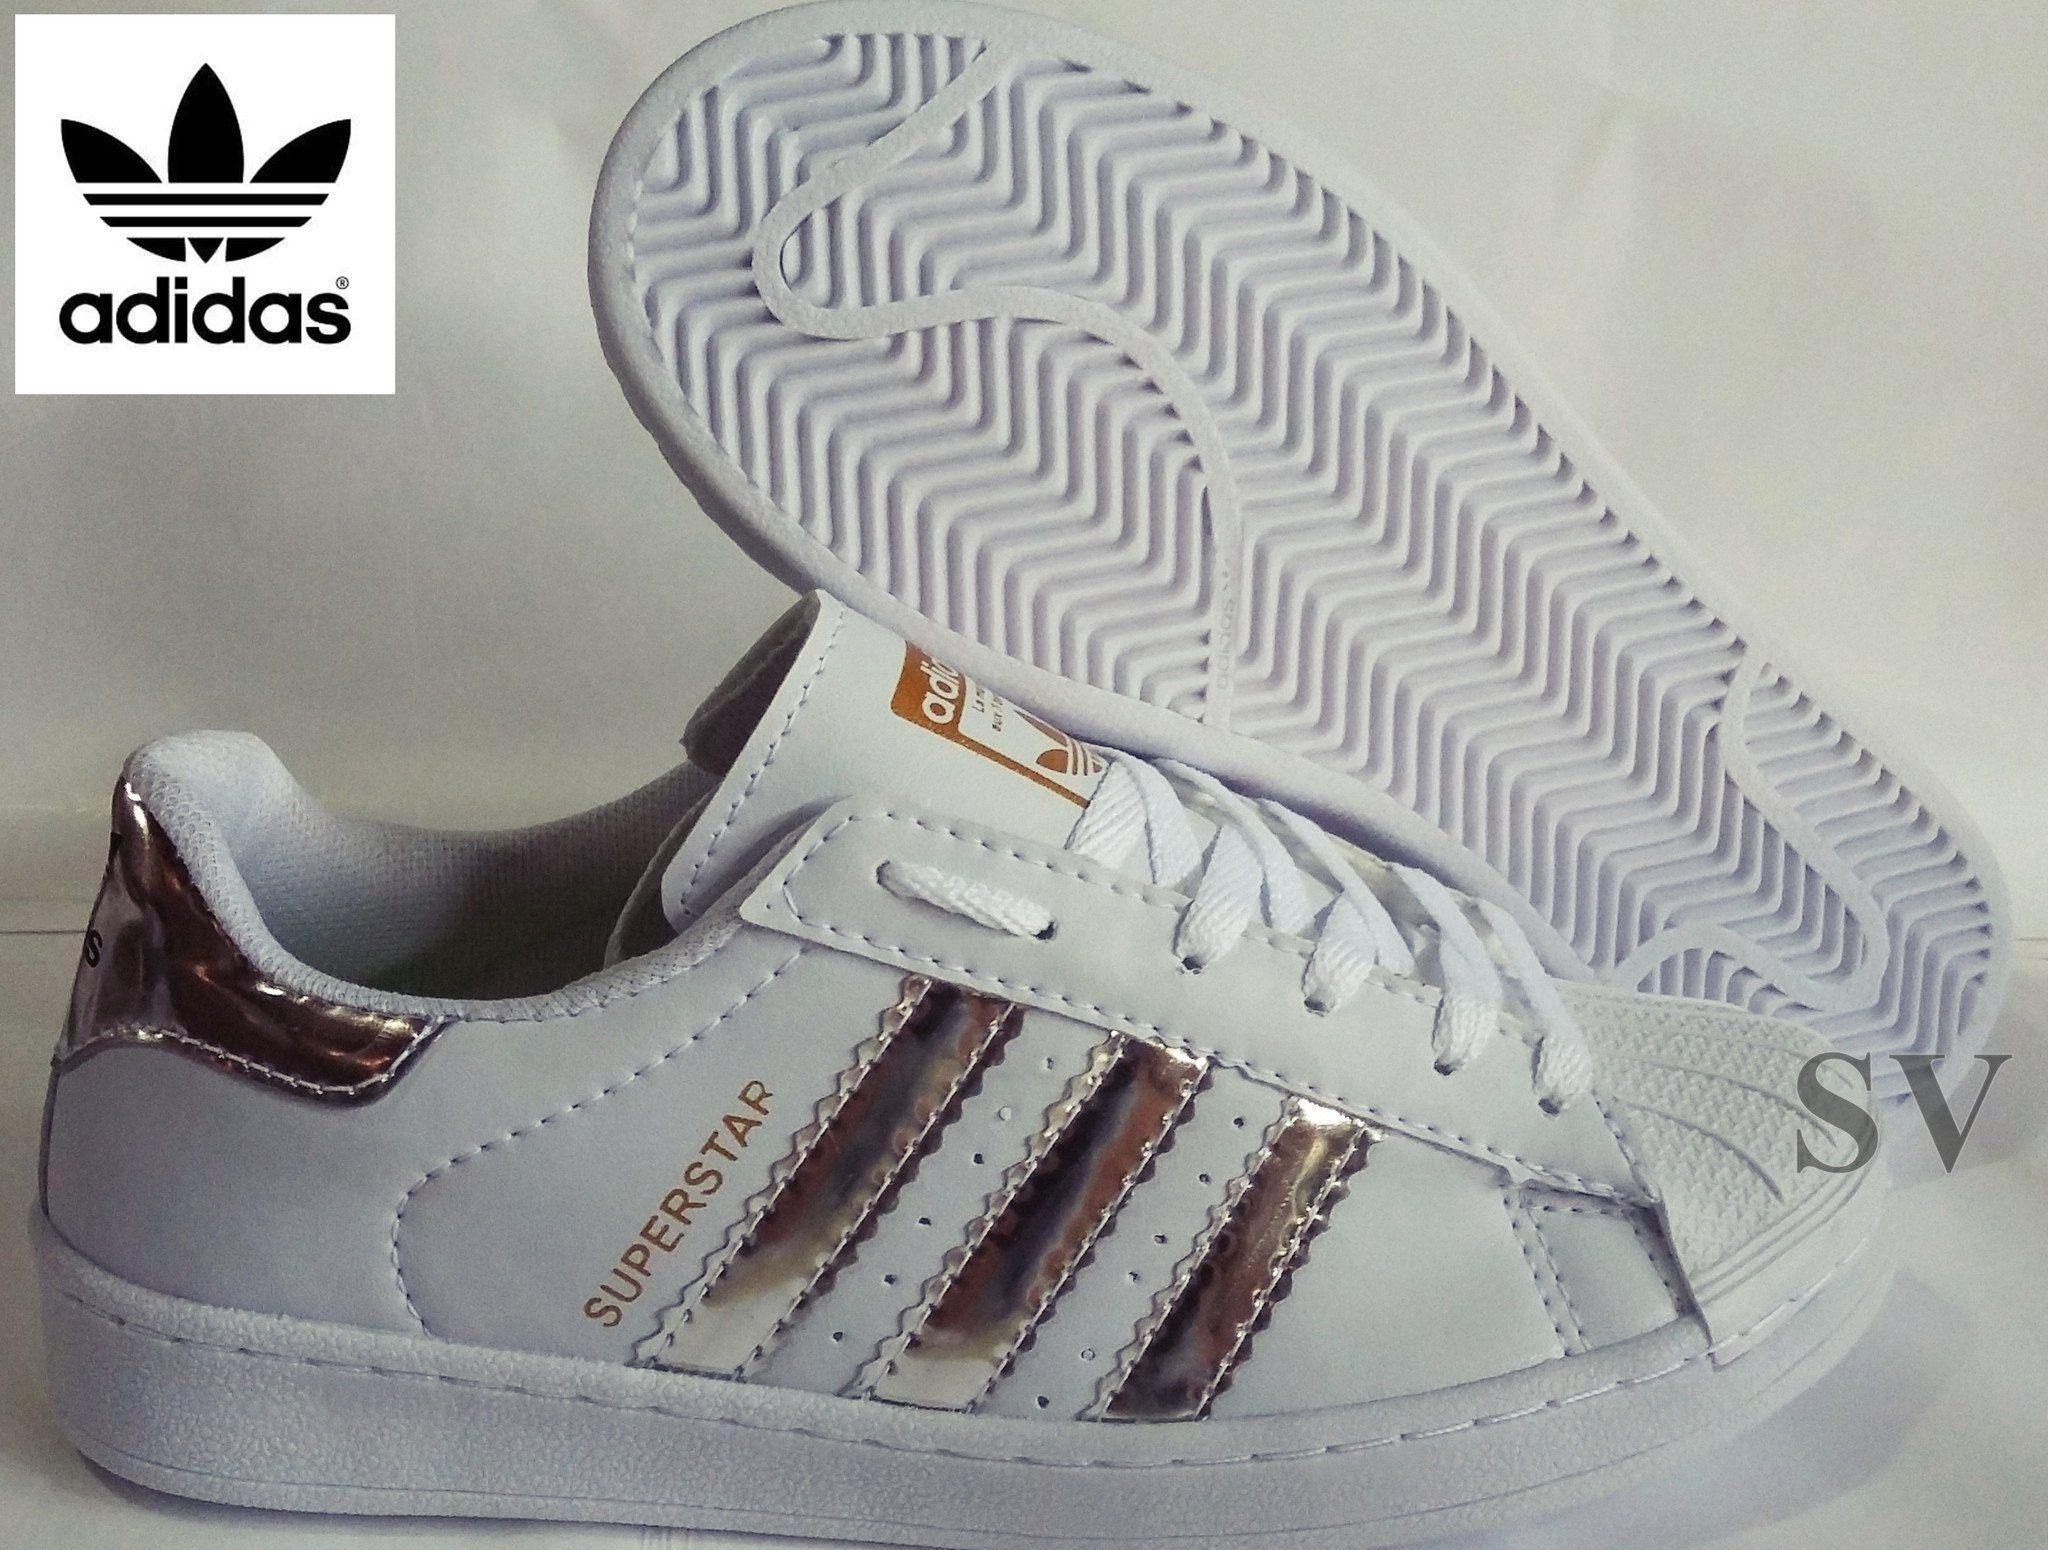 tenis adidas super star king cores exclusivas